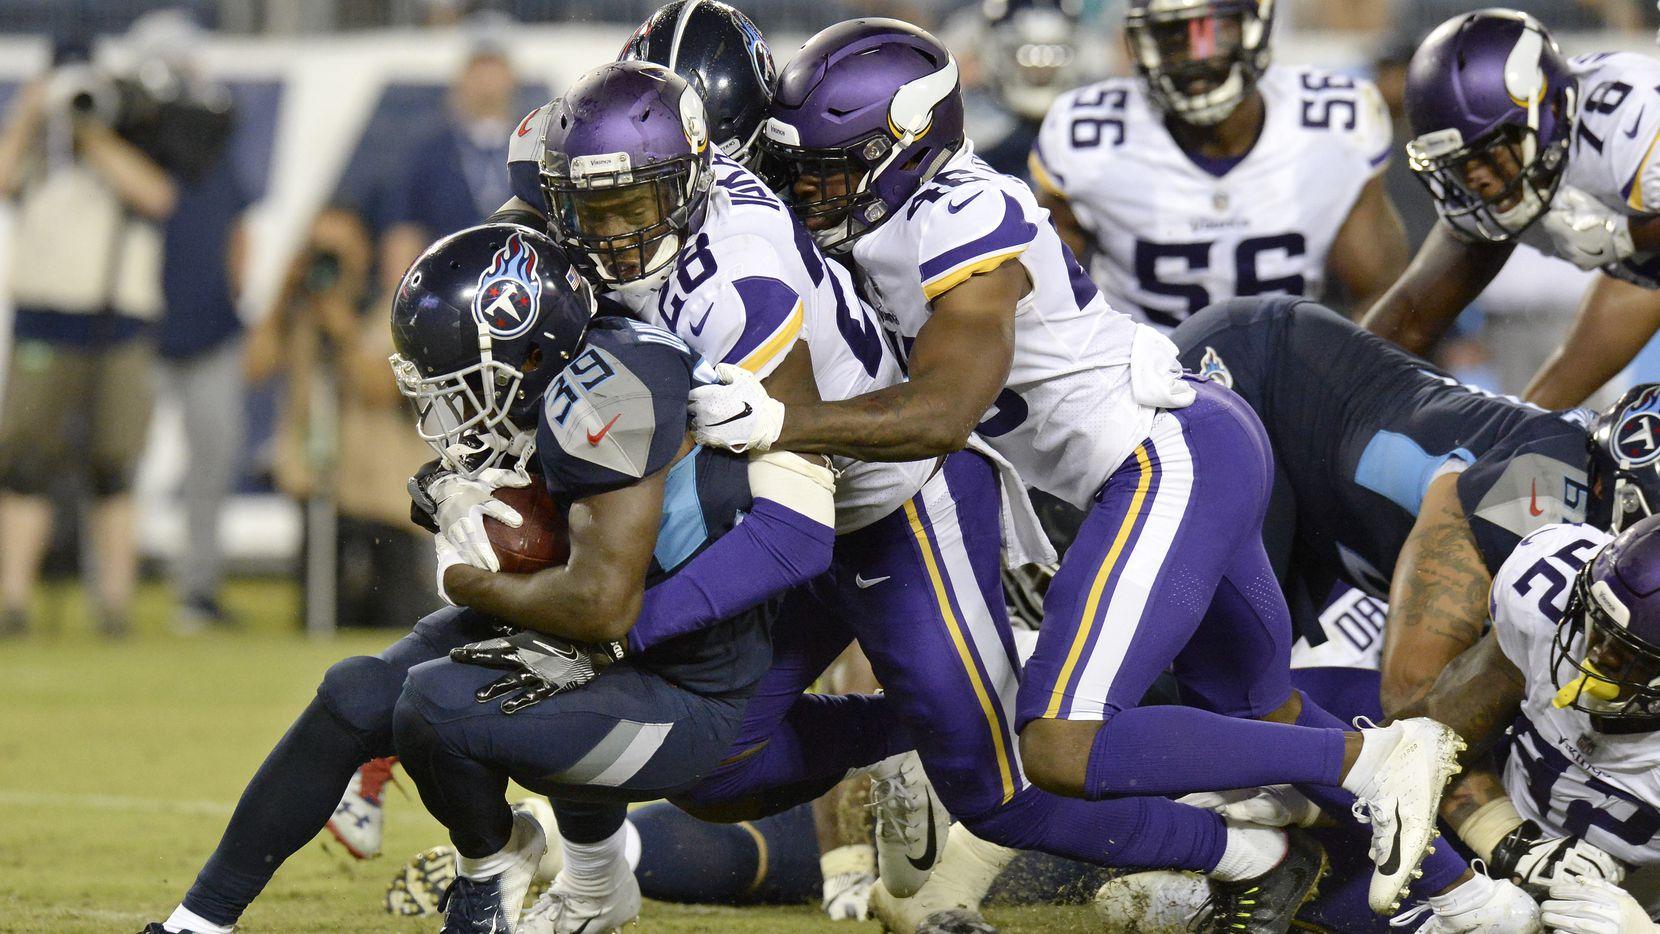 FILE - Tennessee Titans running back Dalyn Dawkins (39) is stopped by Minnesota Vikings defensive back George Iloka (28) in the second half of a preseason NFL football game Thursday, Aug. 30, 2018, in Nashville, Tenn. (AP Photo/Mark Zaleski)